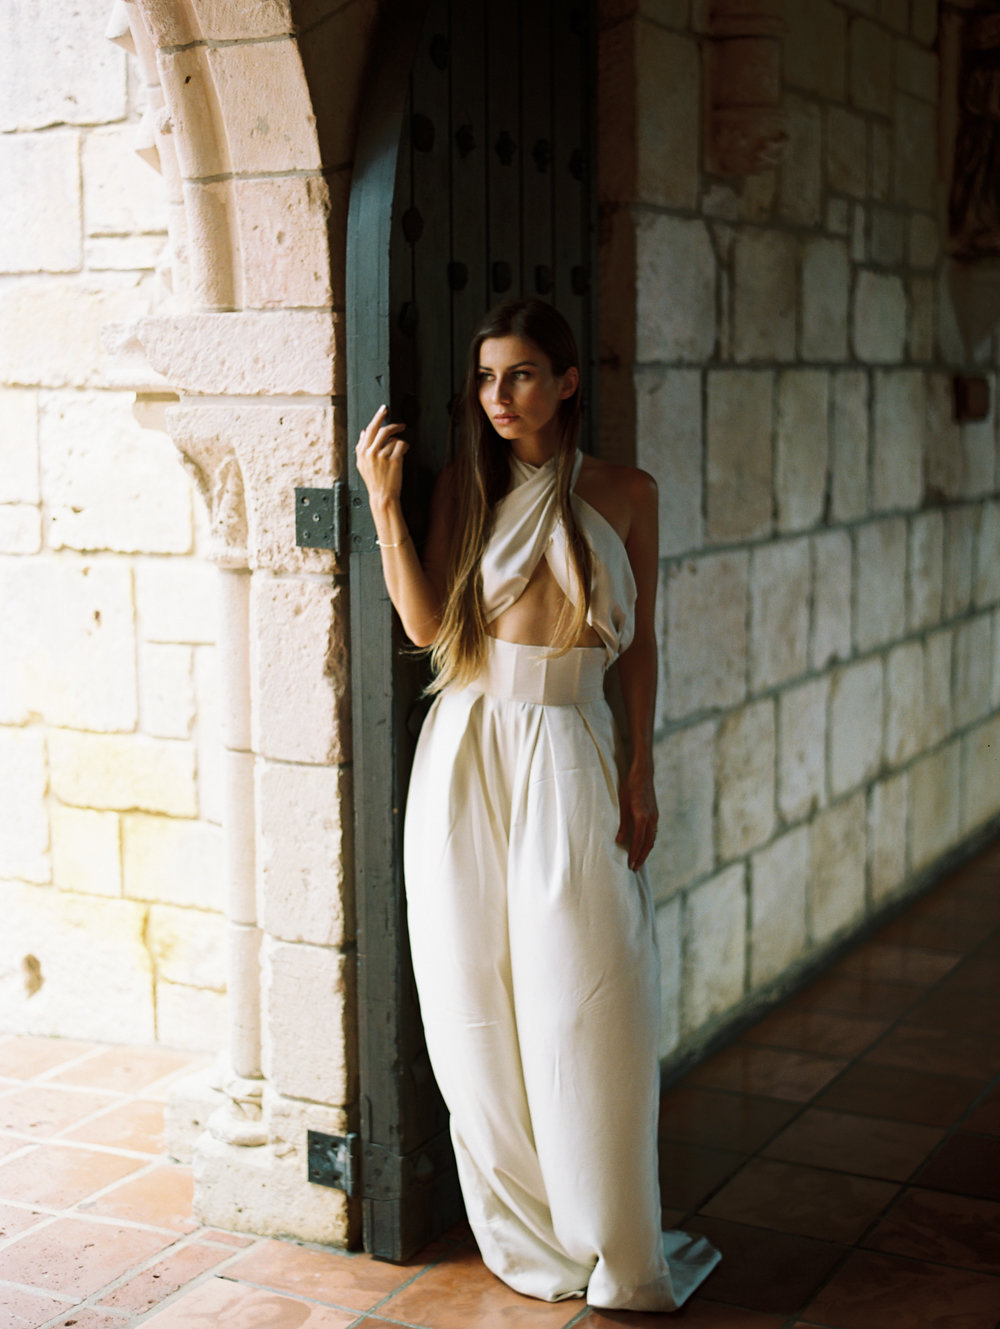 LaurenKinsey_SpainWedding_LisbonWedding_MiamiWedding023.JPG